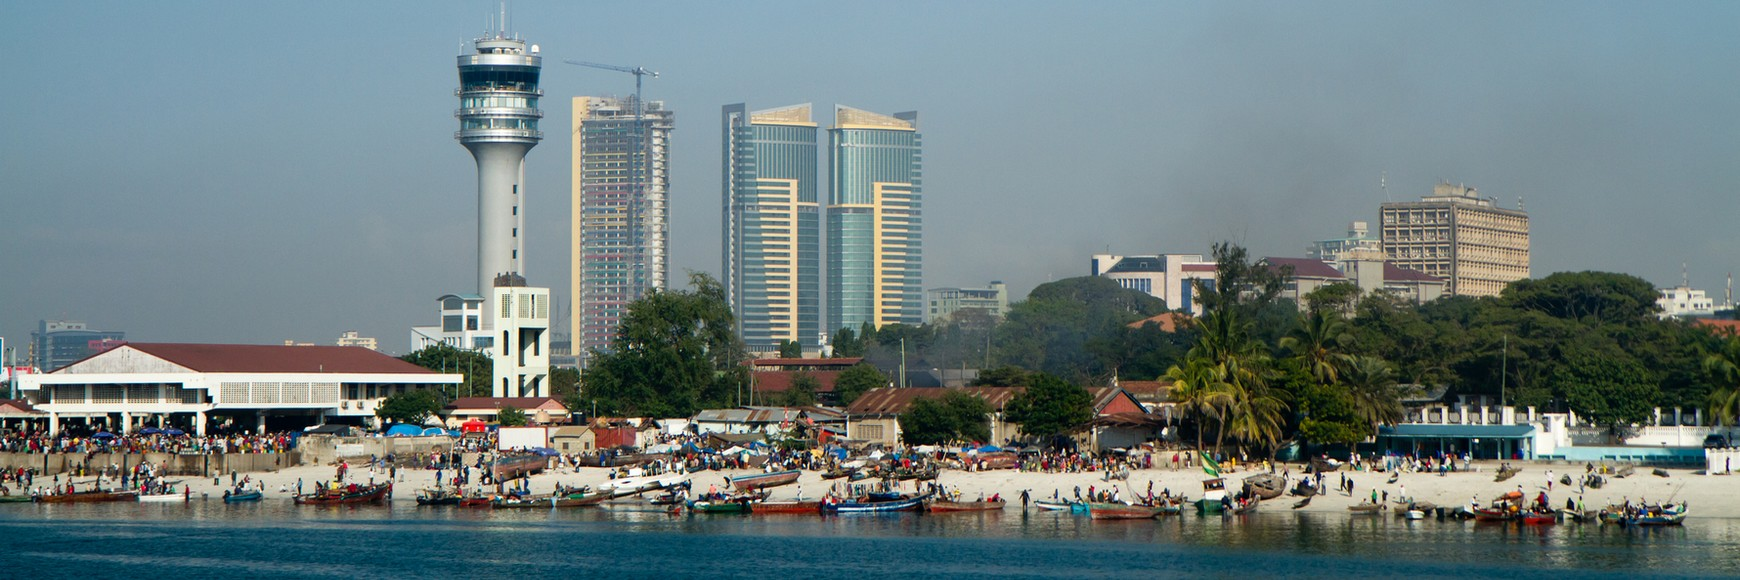 noleggio barca a motore Tanzania